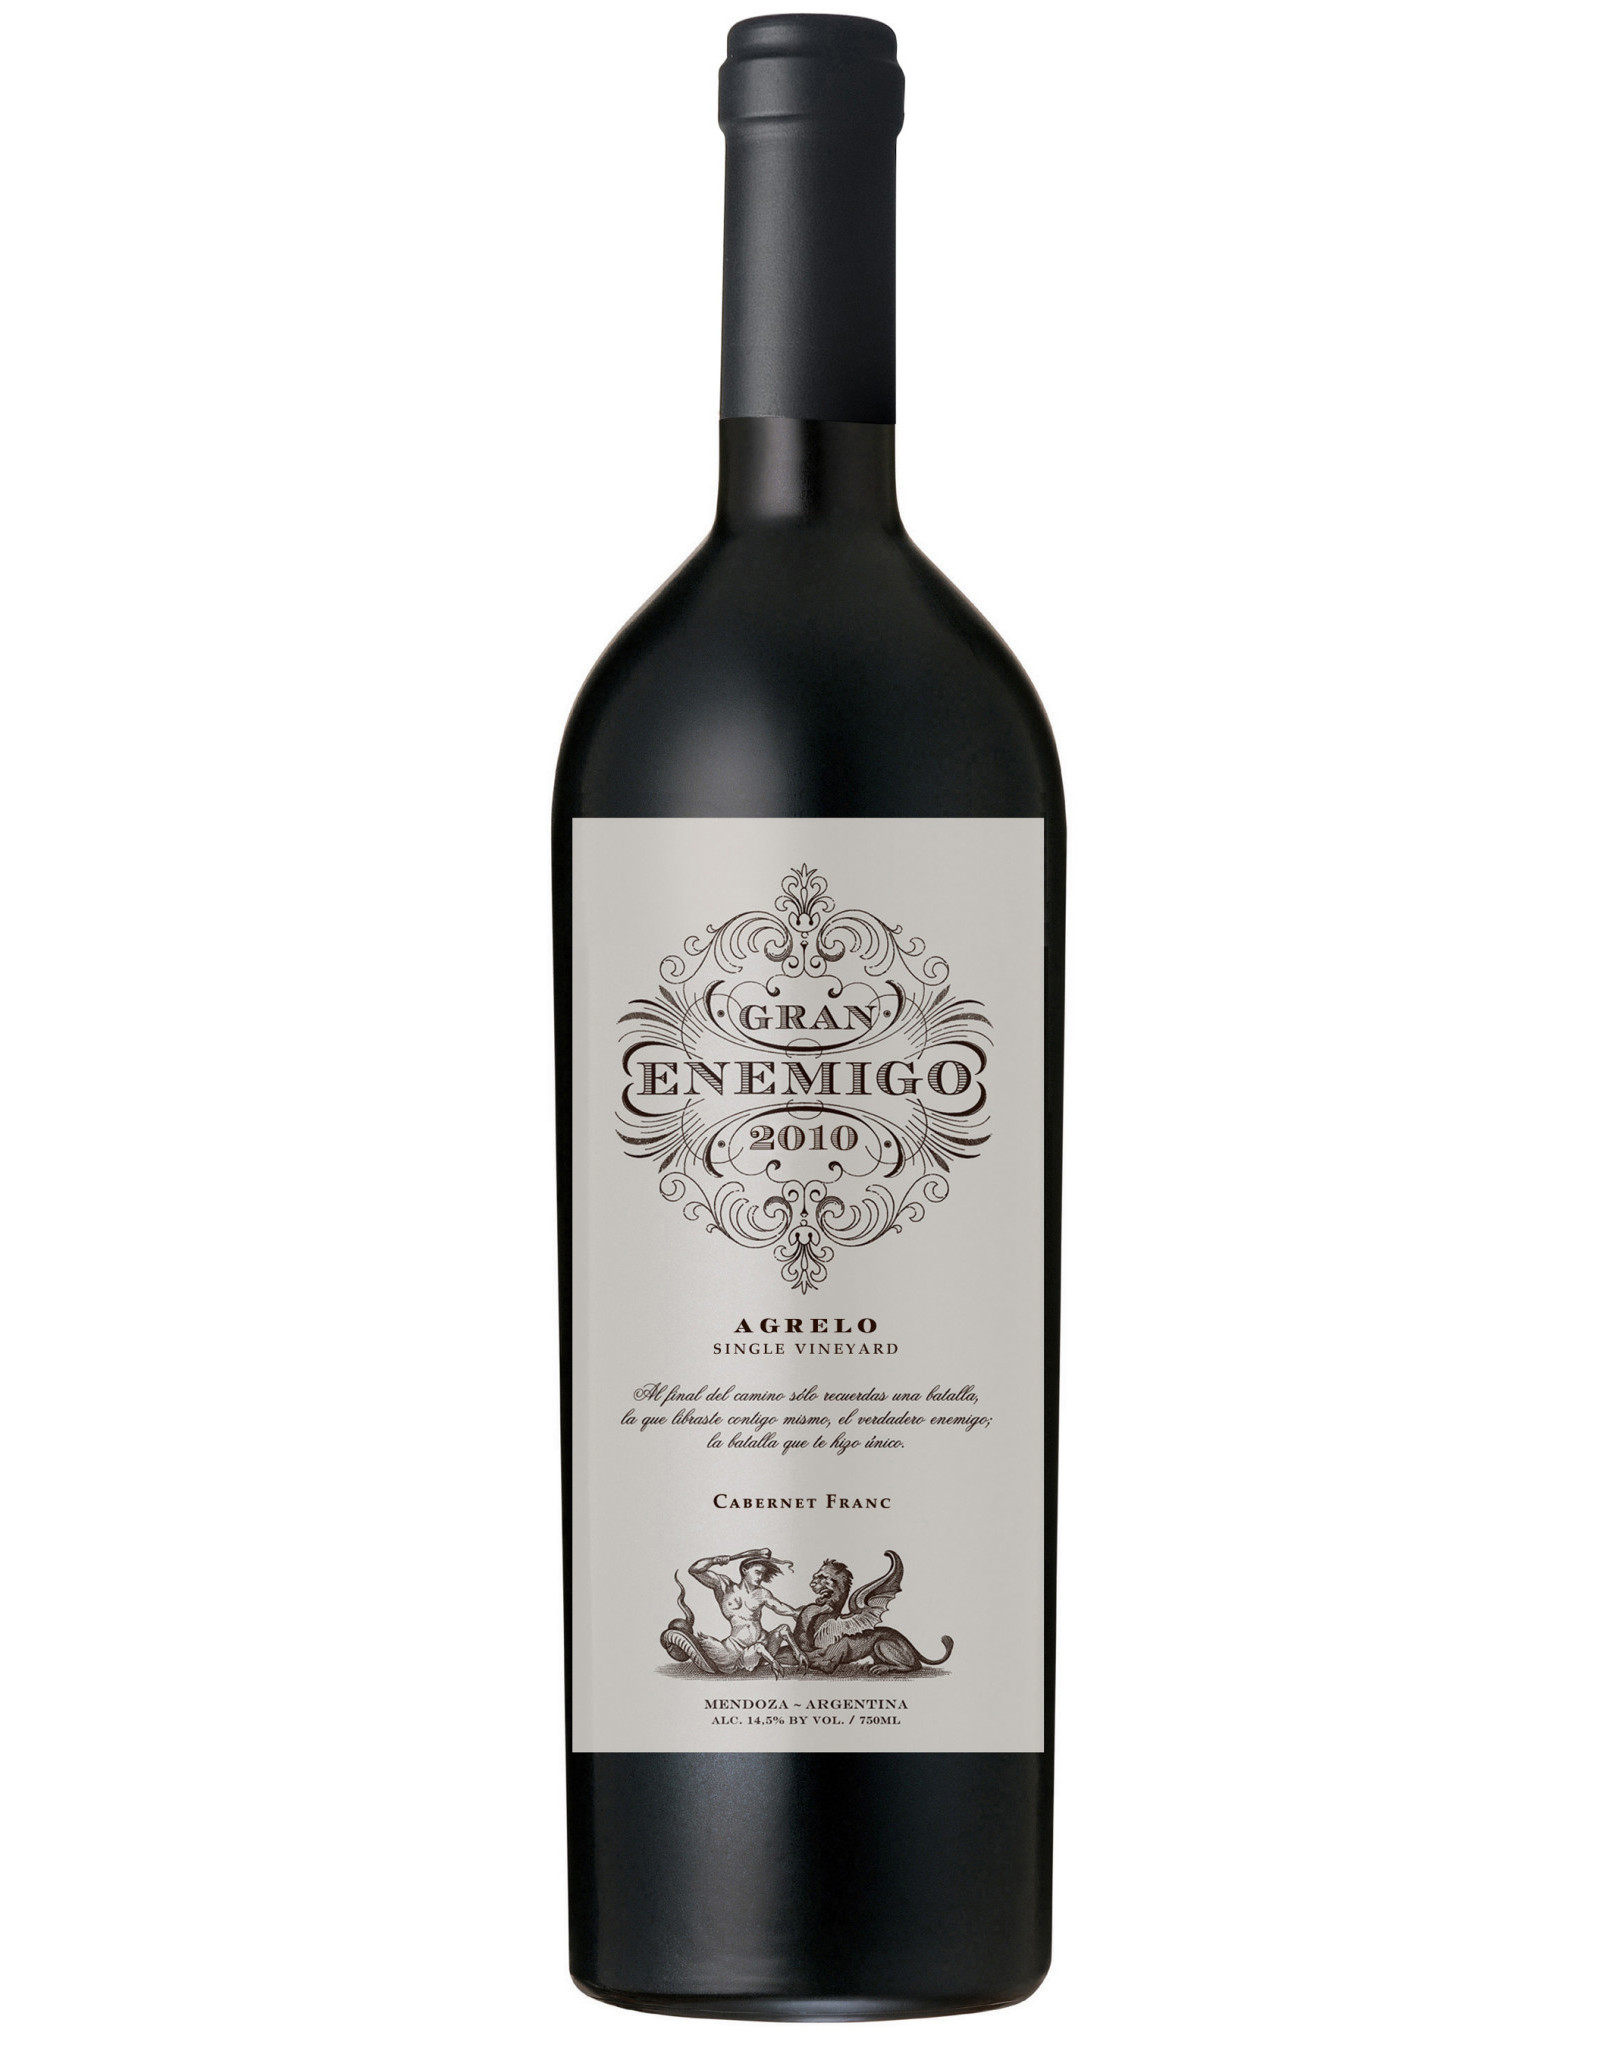 Gran Enemigo 'Agrelo' Single Vineyard Cabernet Franc